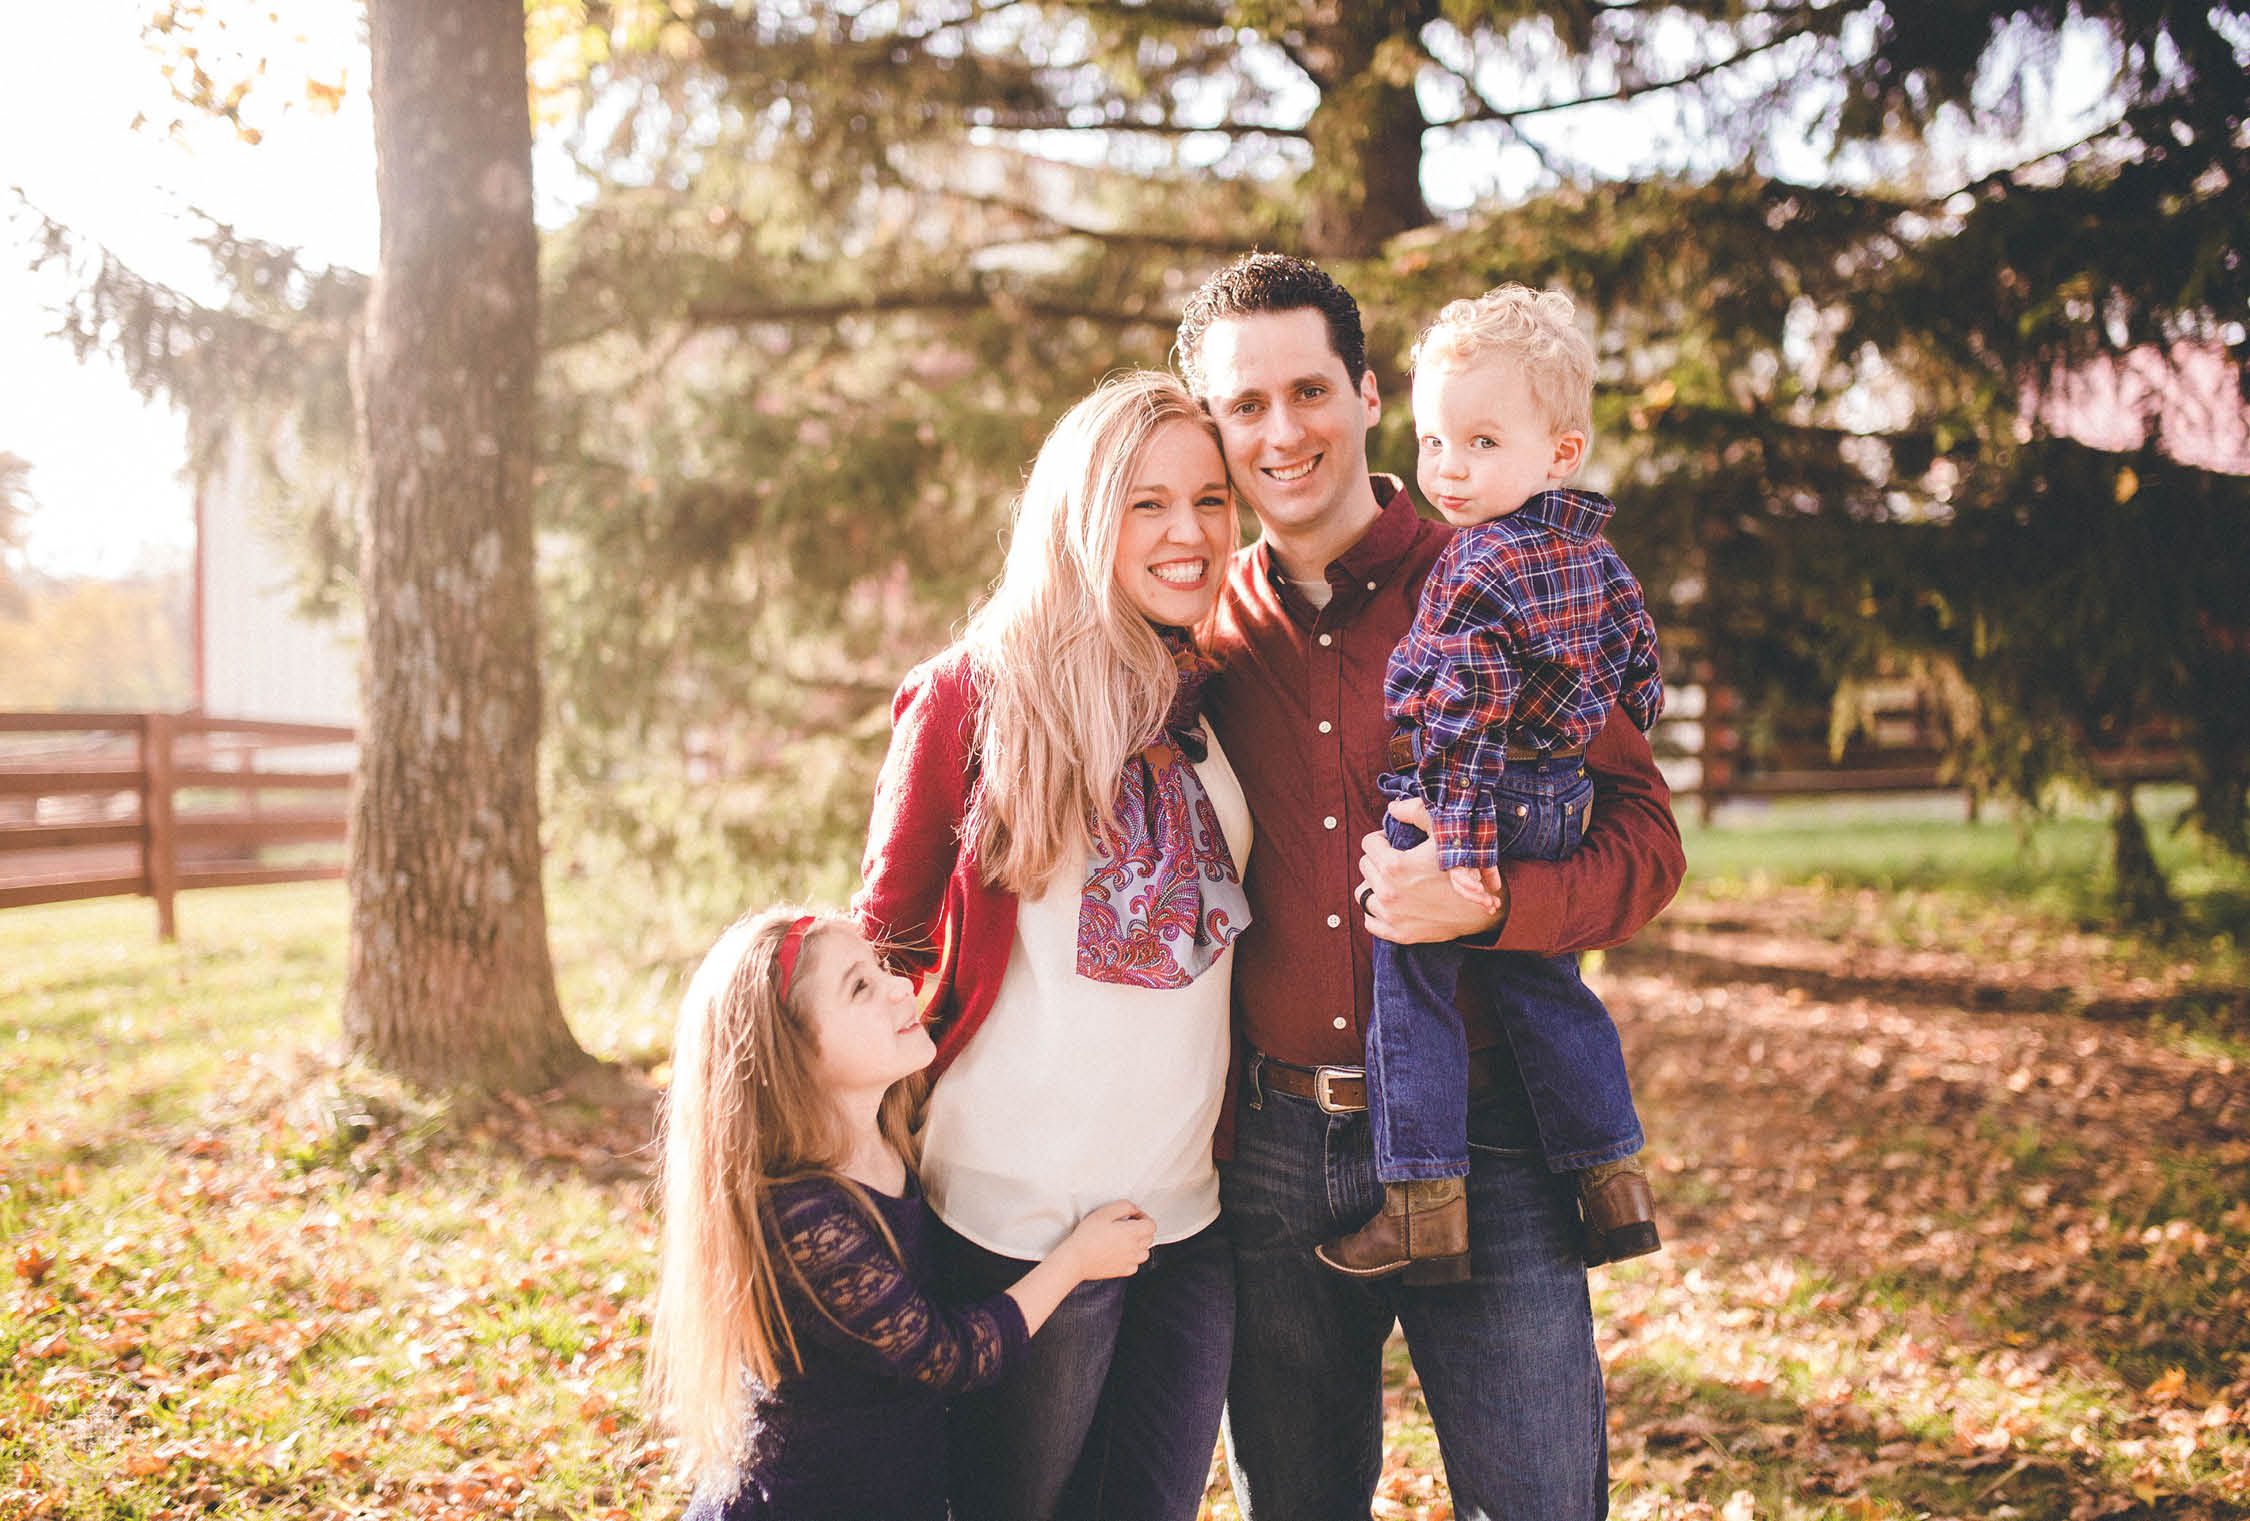 vance-family-children-photographer-dayton-ohio-4.jpg